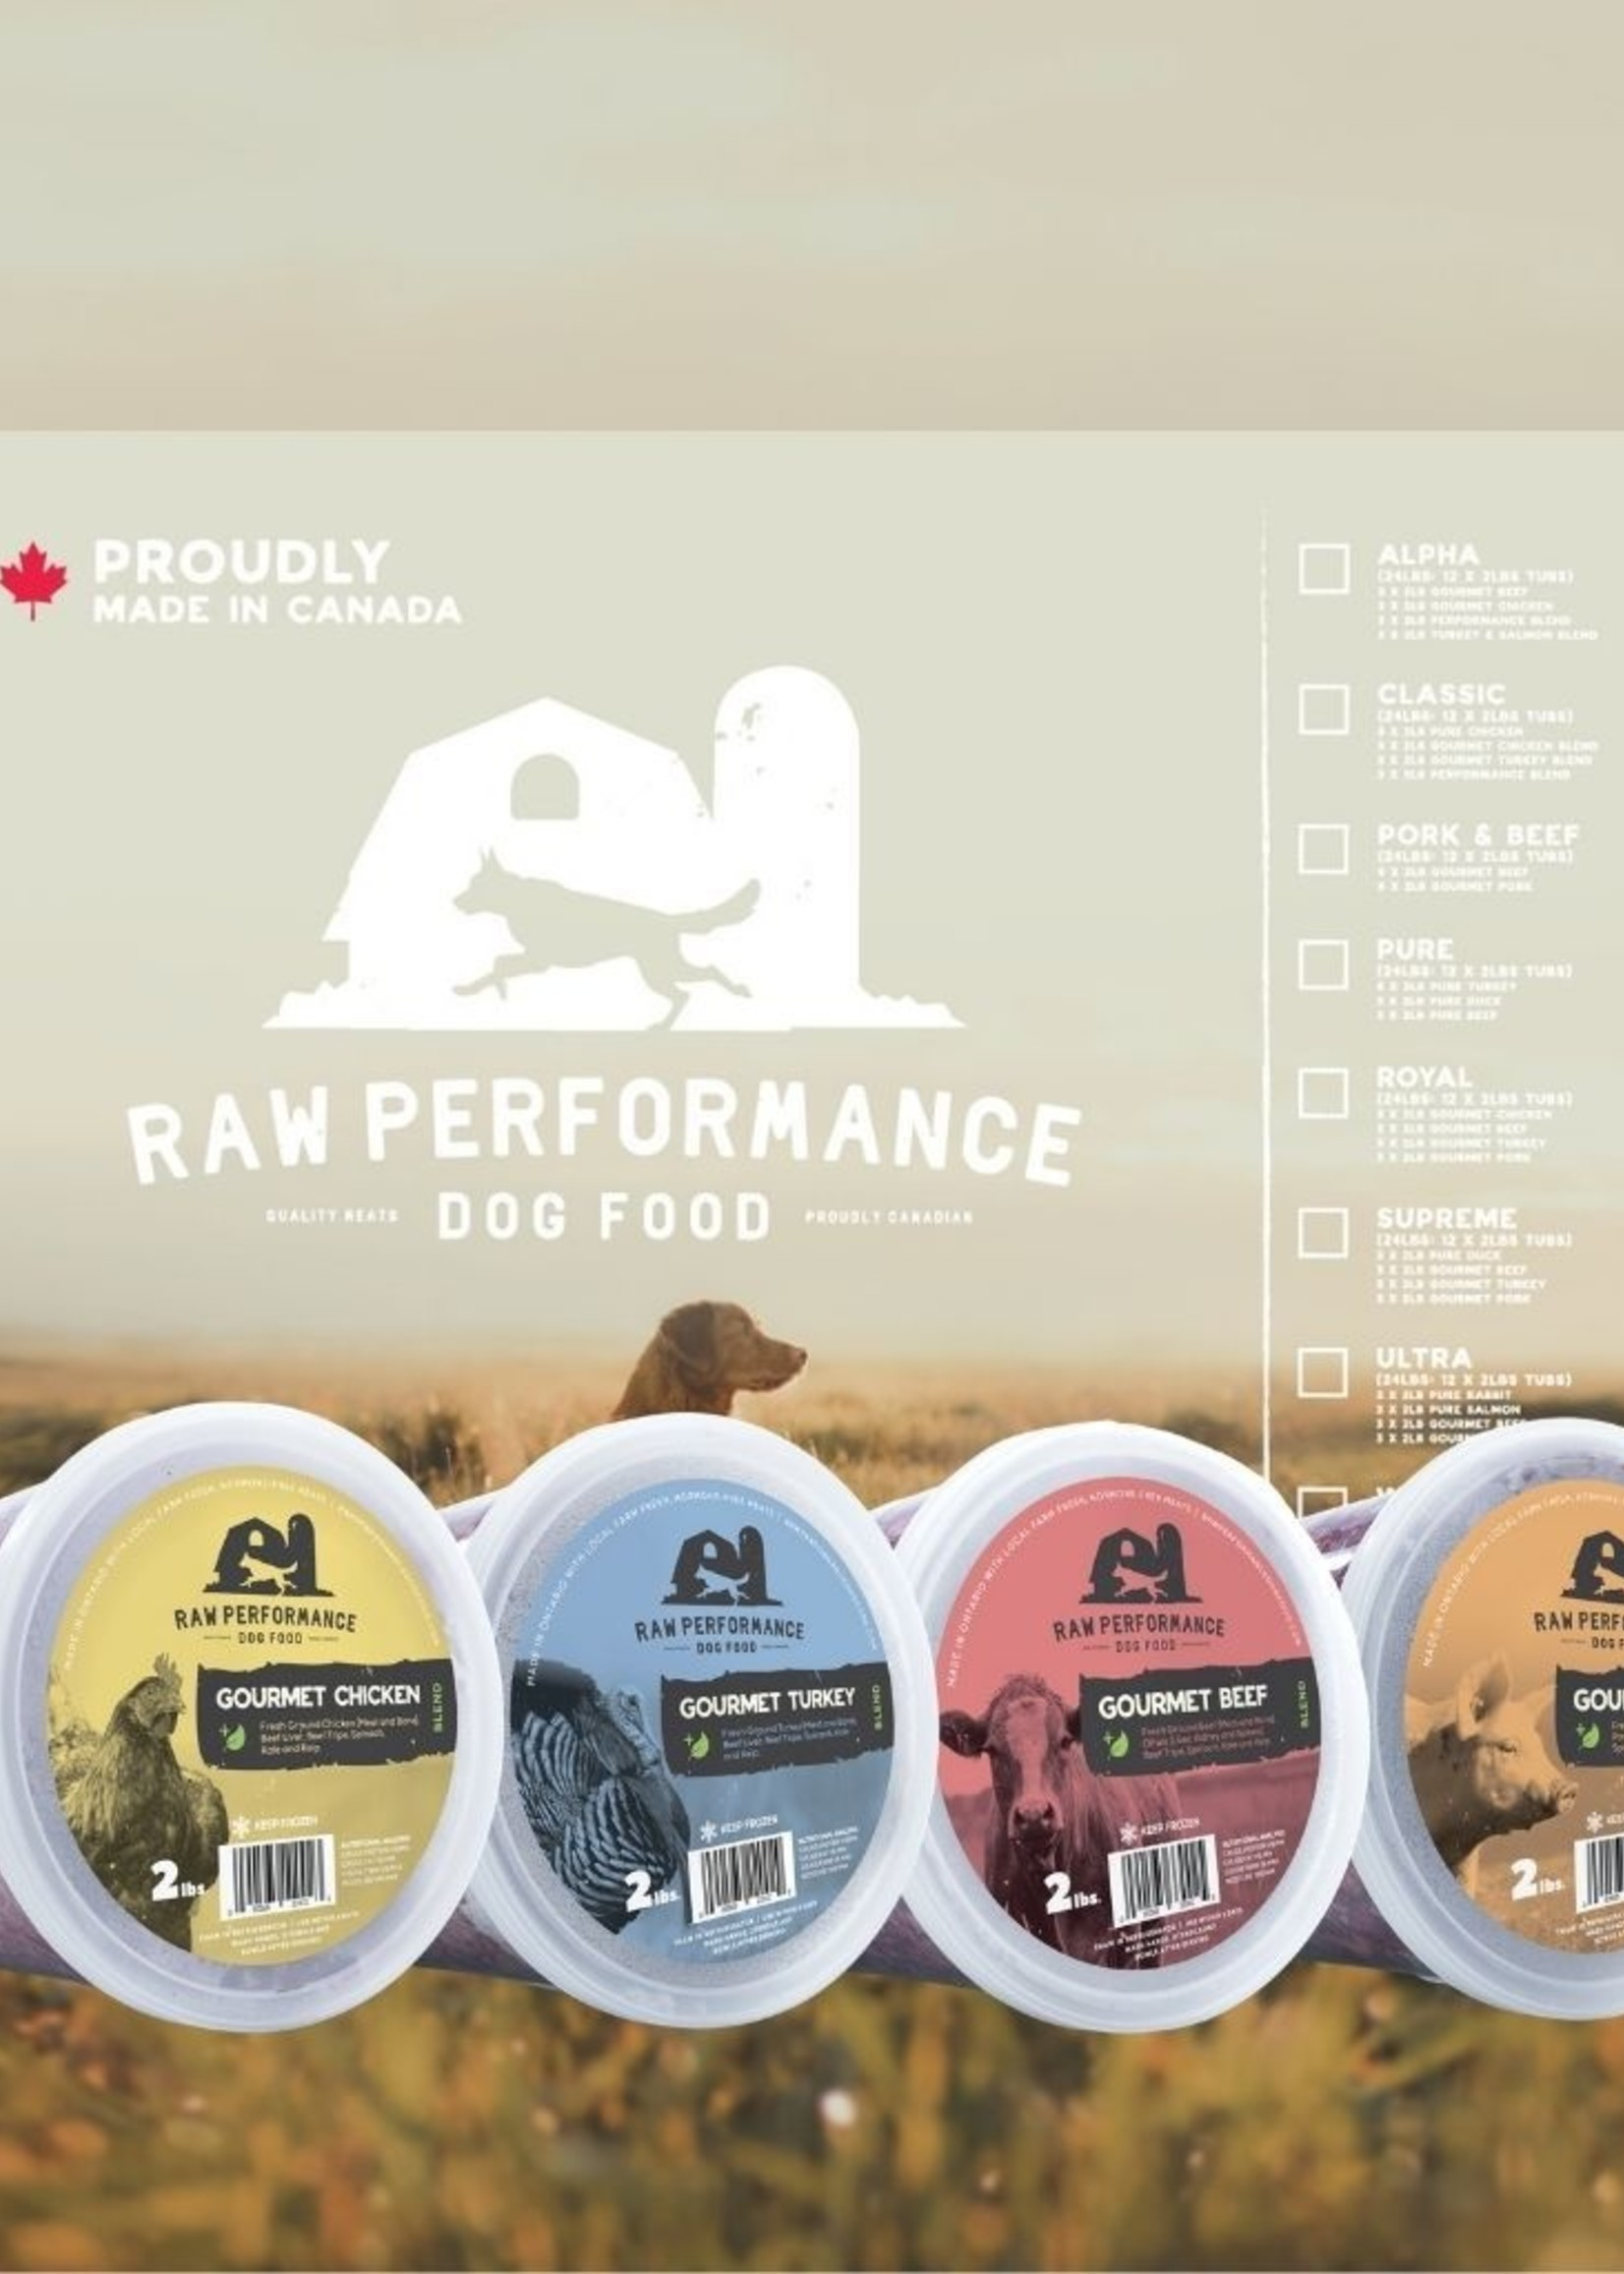 Raw Performance Raw Performance Case: The Royal 24lbs